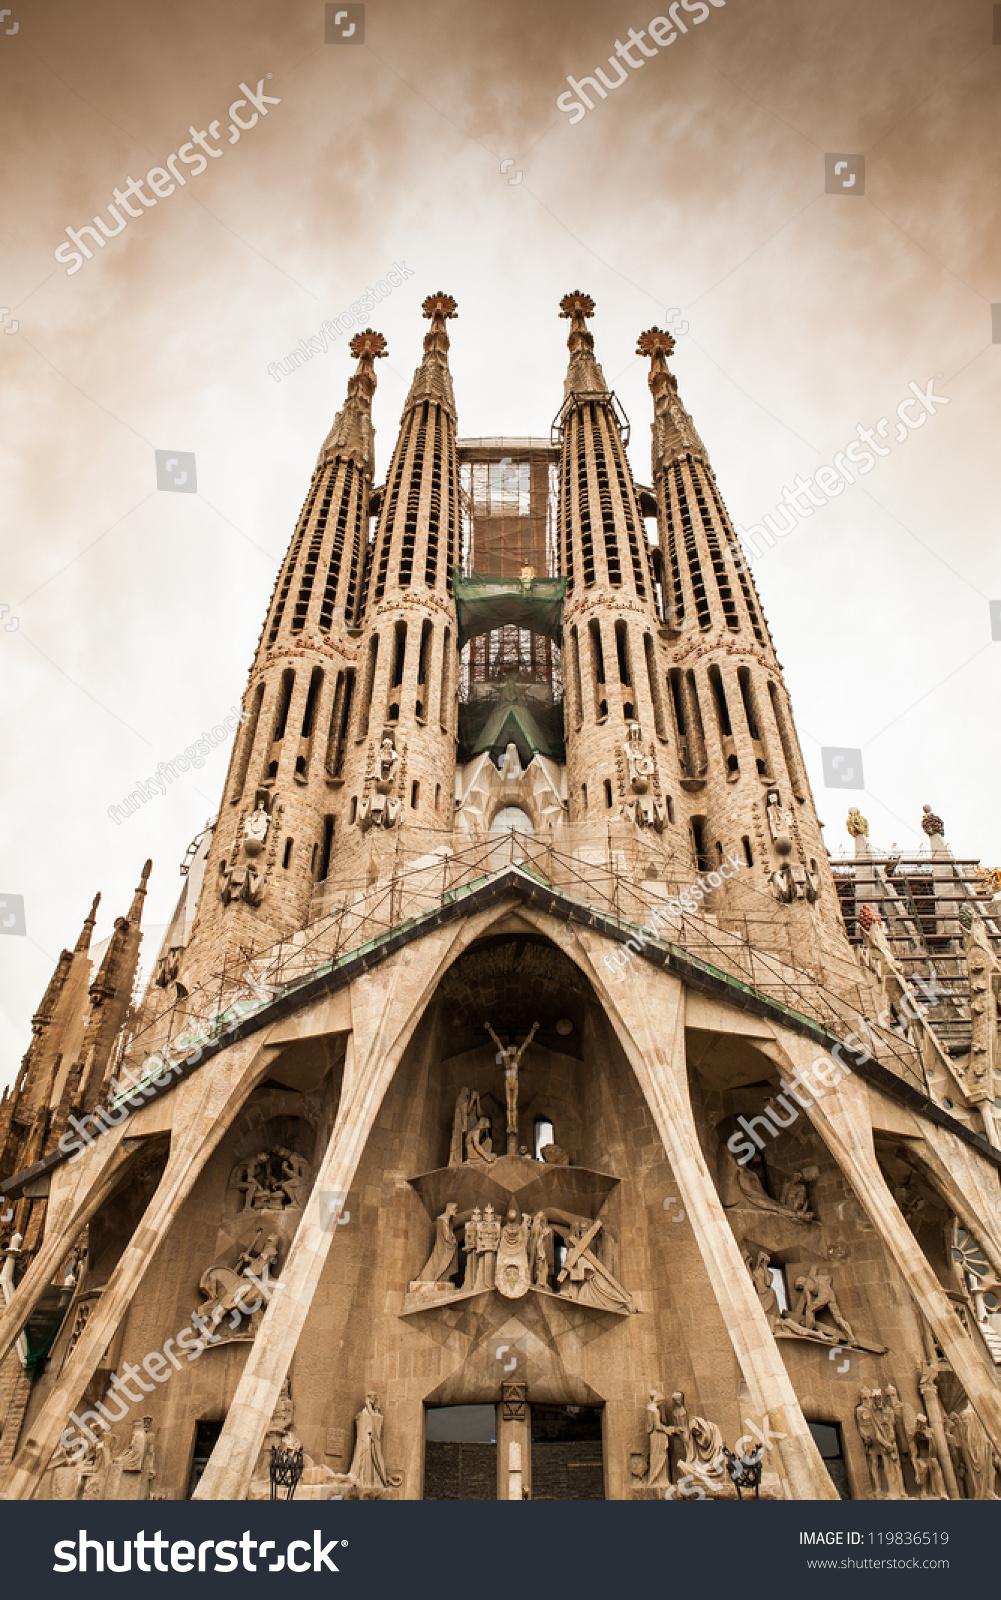 Frontal view this architecture masterpiece la stock photo for Antoni gaudi sagrada familia architecture